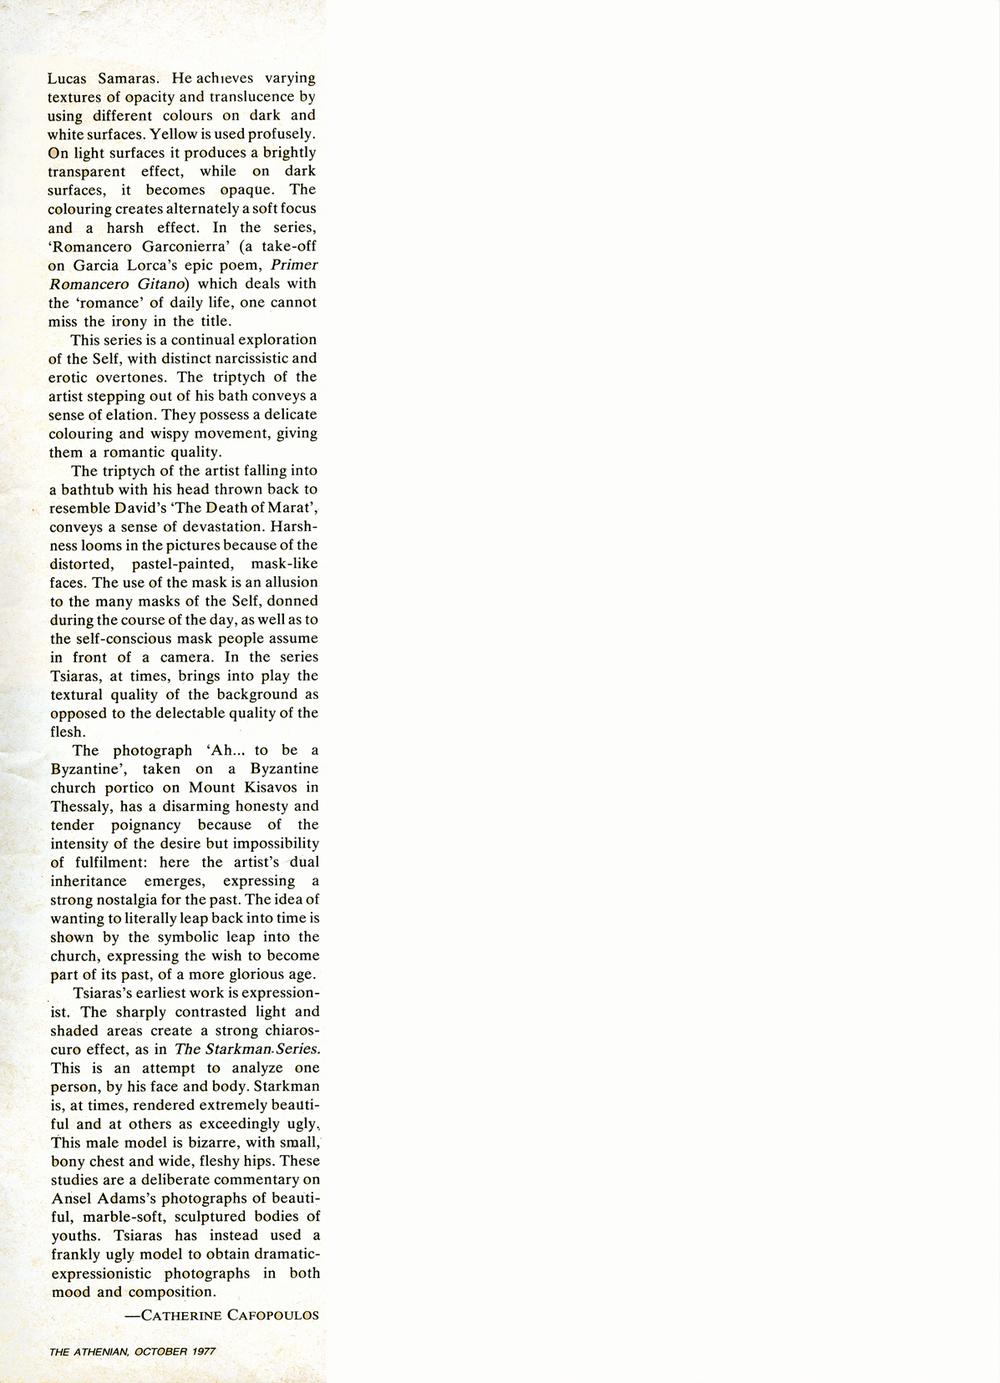 athenian-oct-77-pg2.jpg